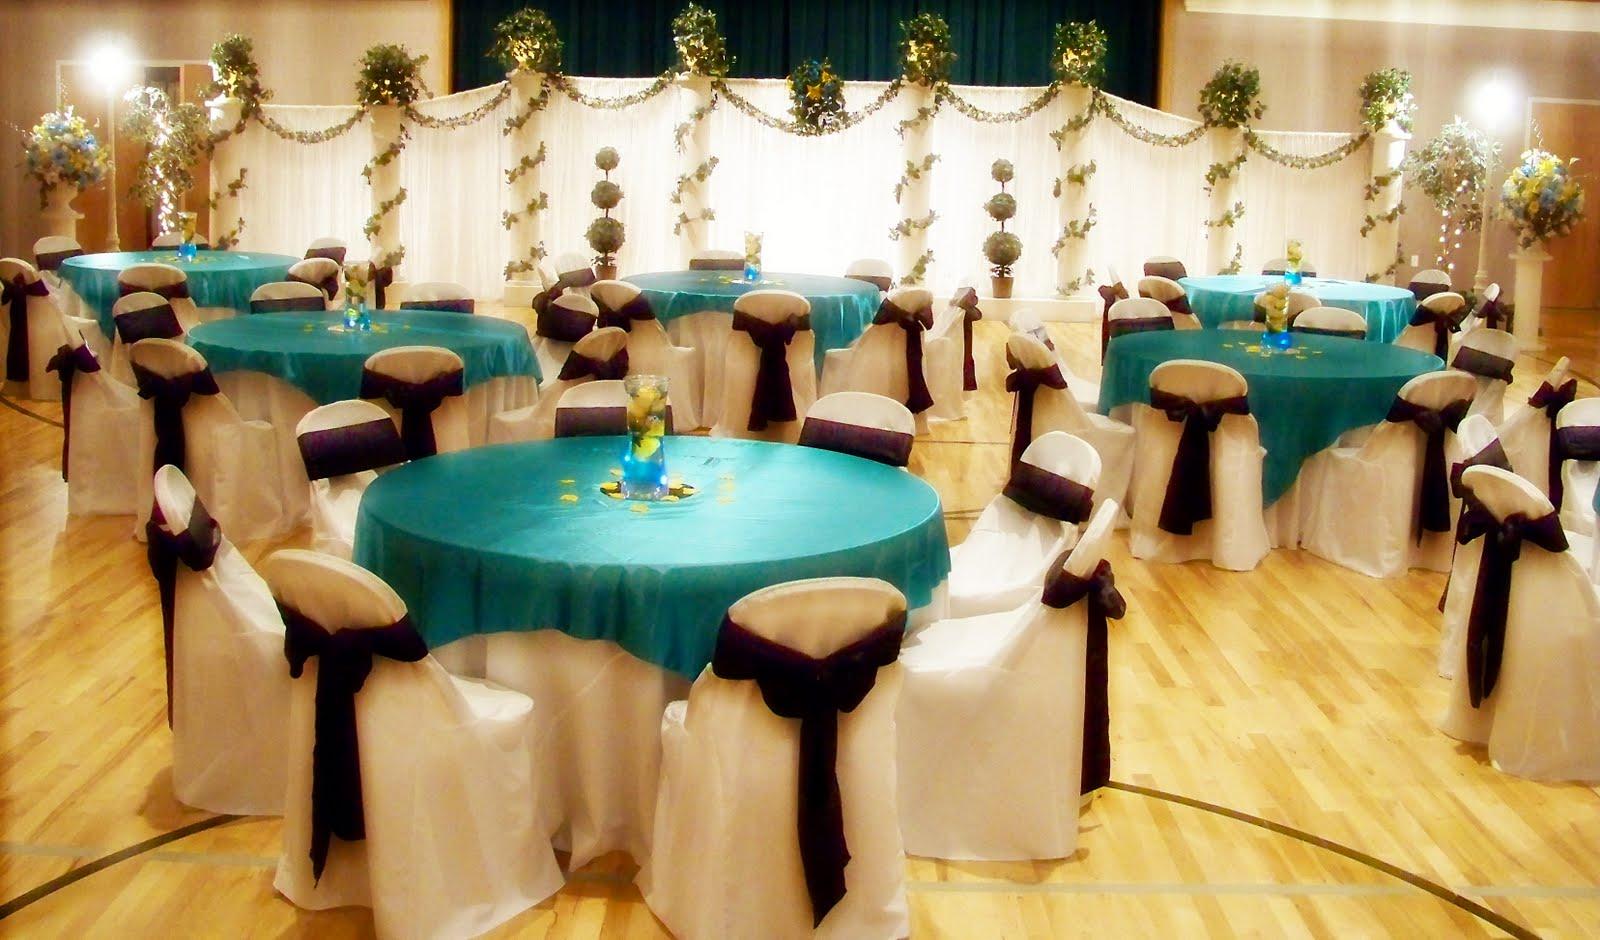 Chocolate And Teal Wedding Reception: Wedding Decoration: April 2014